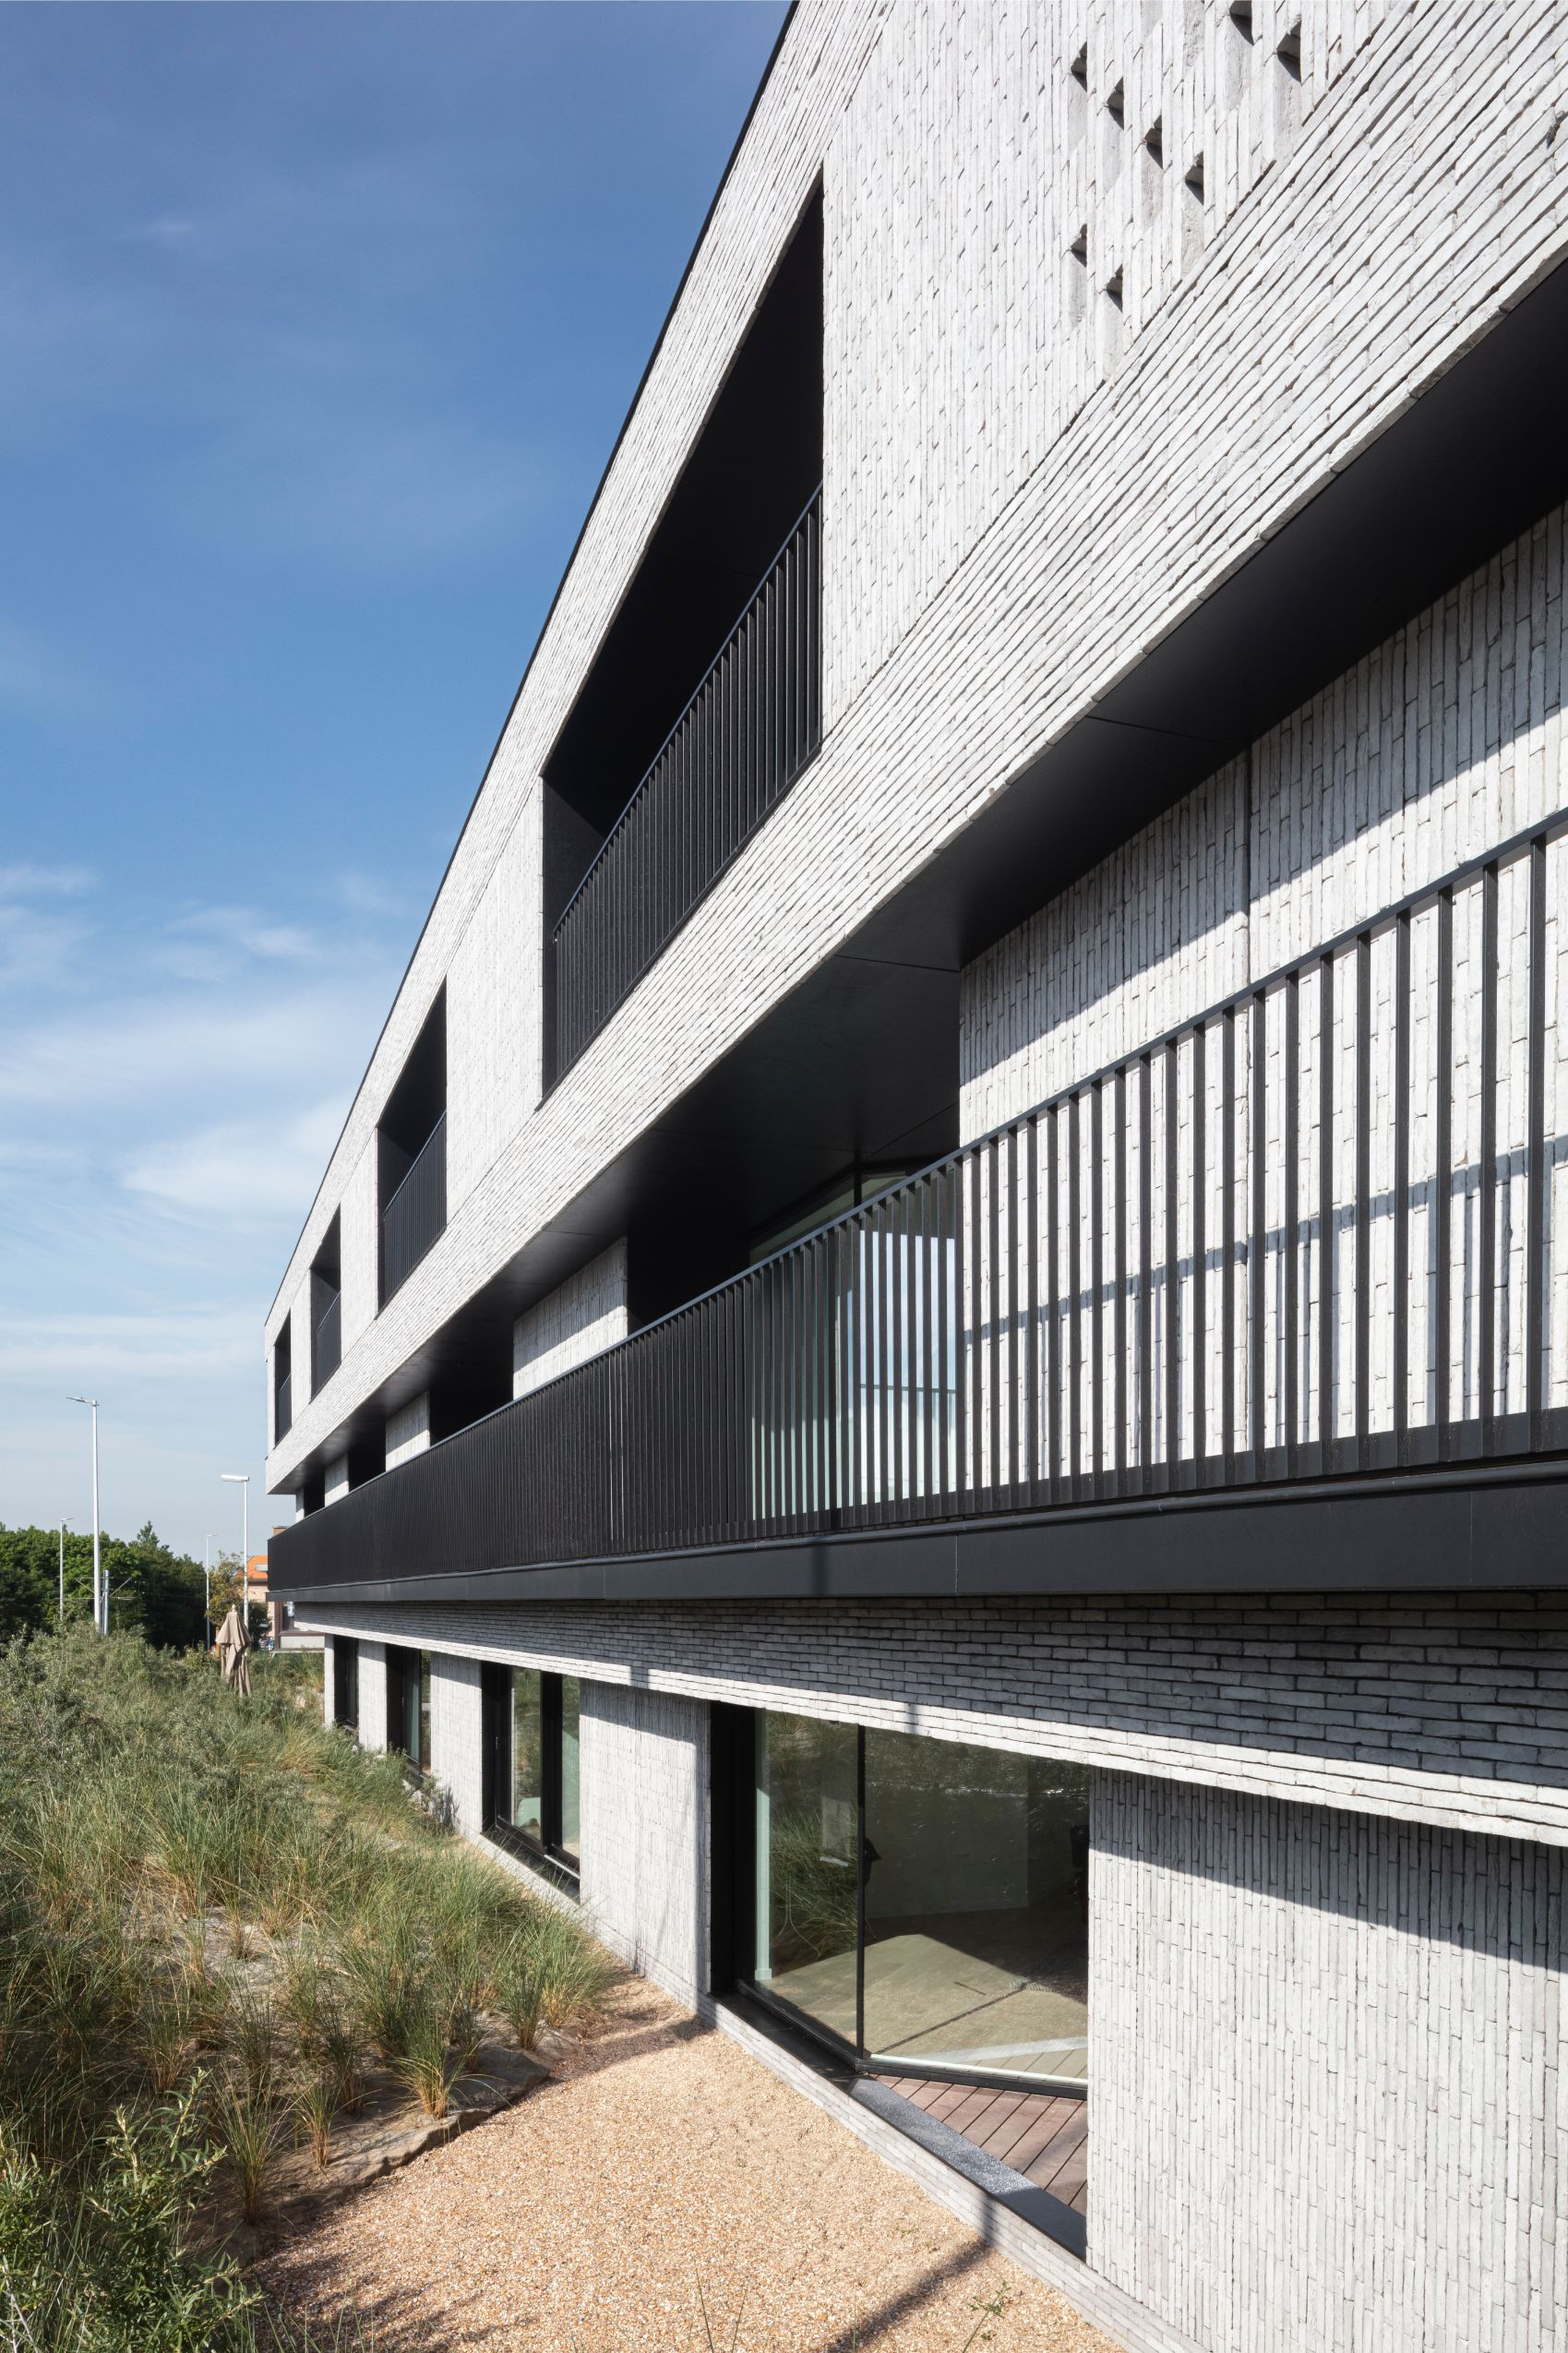 Pierre Paulin - Rietveldprojects - Sint-Idesbald - Tvdv6